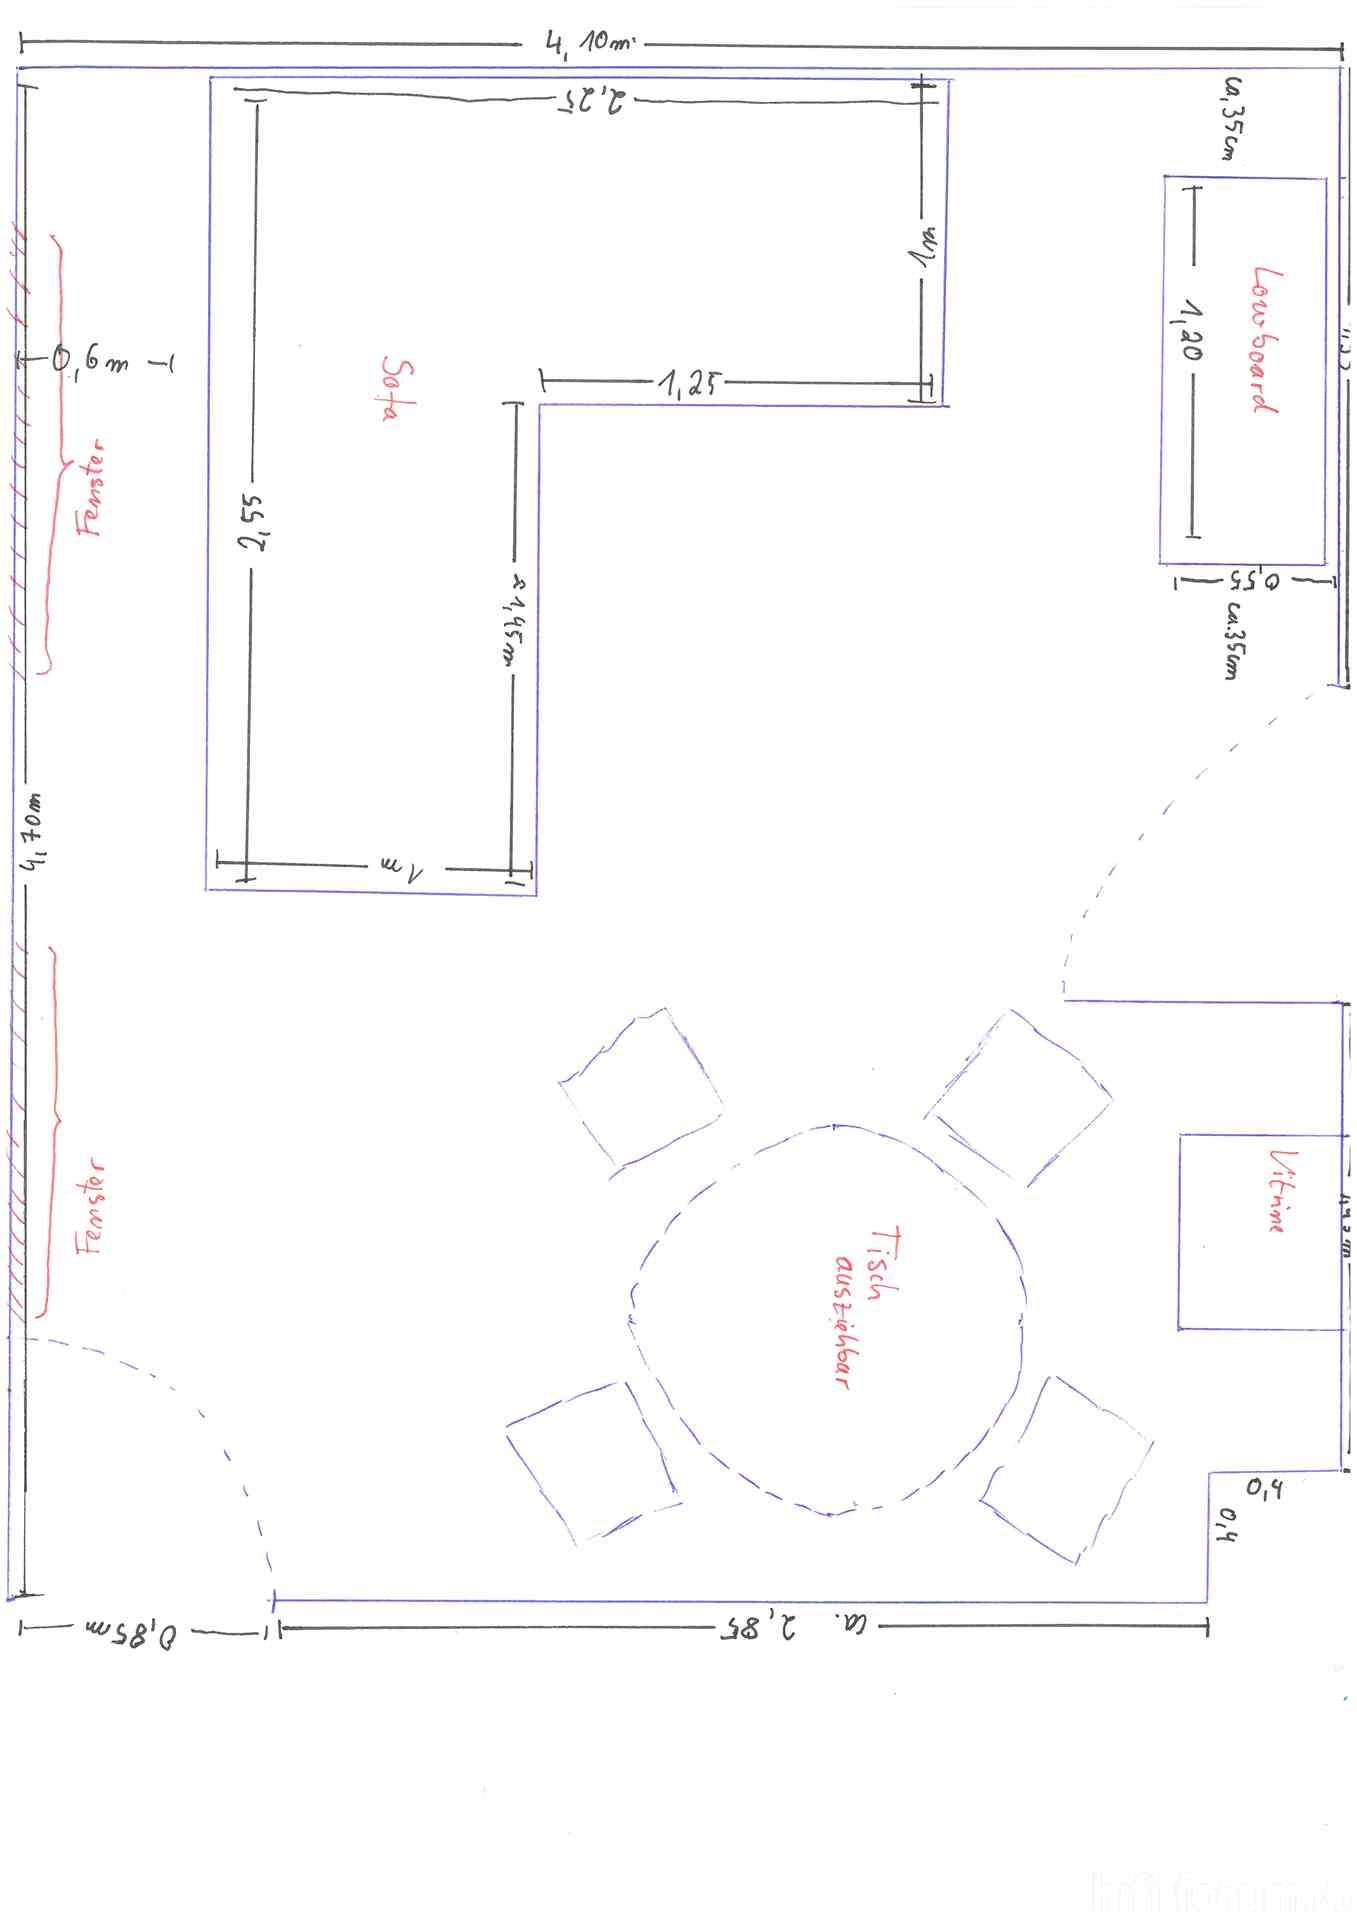 grundriss inklusive m bel akustik grundriss inklusive. Black Bedroom Furniture Sets. Home Design Ideas